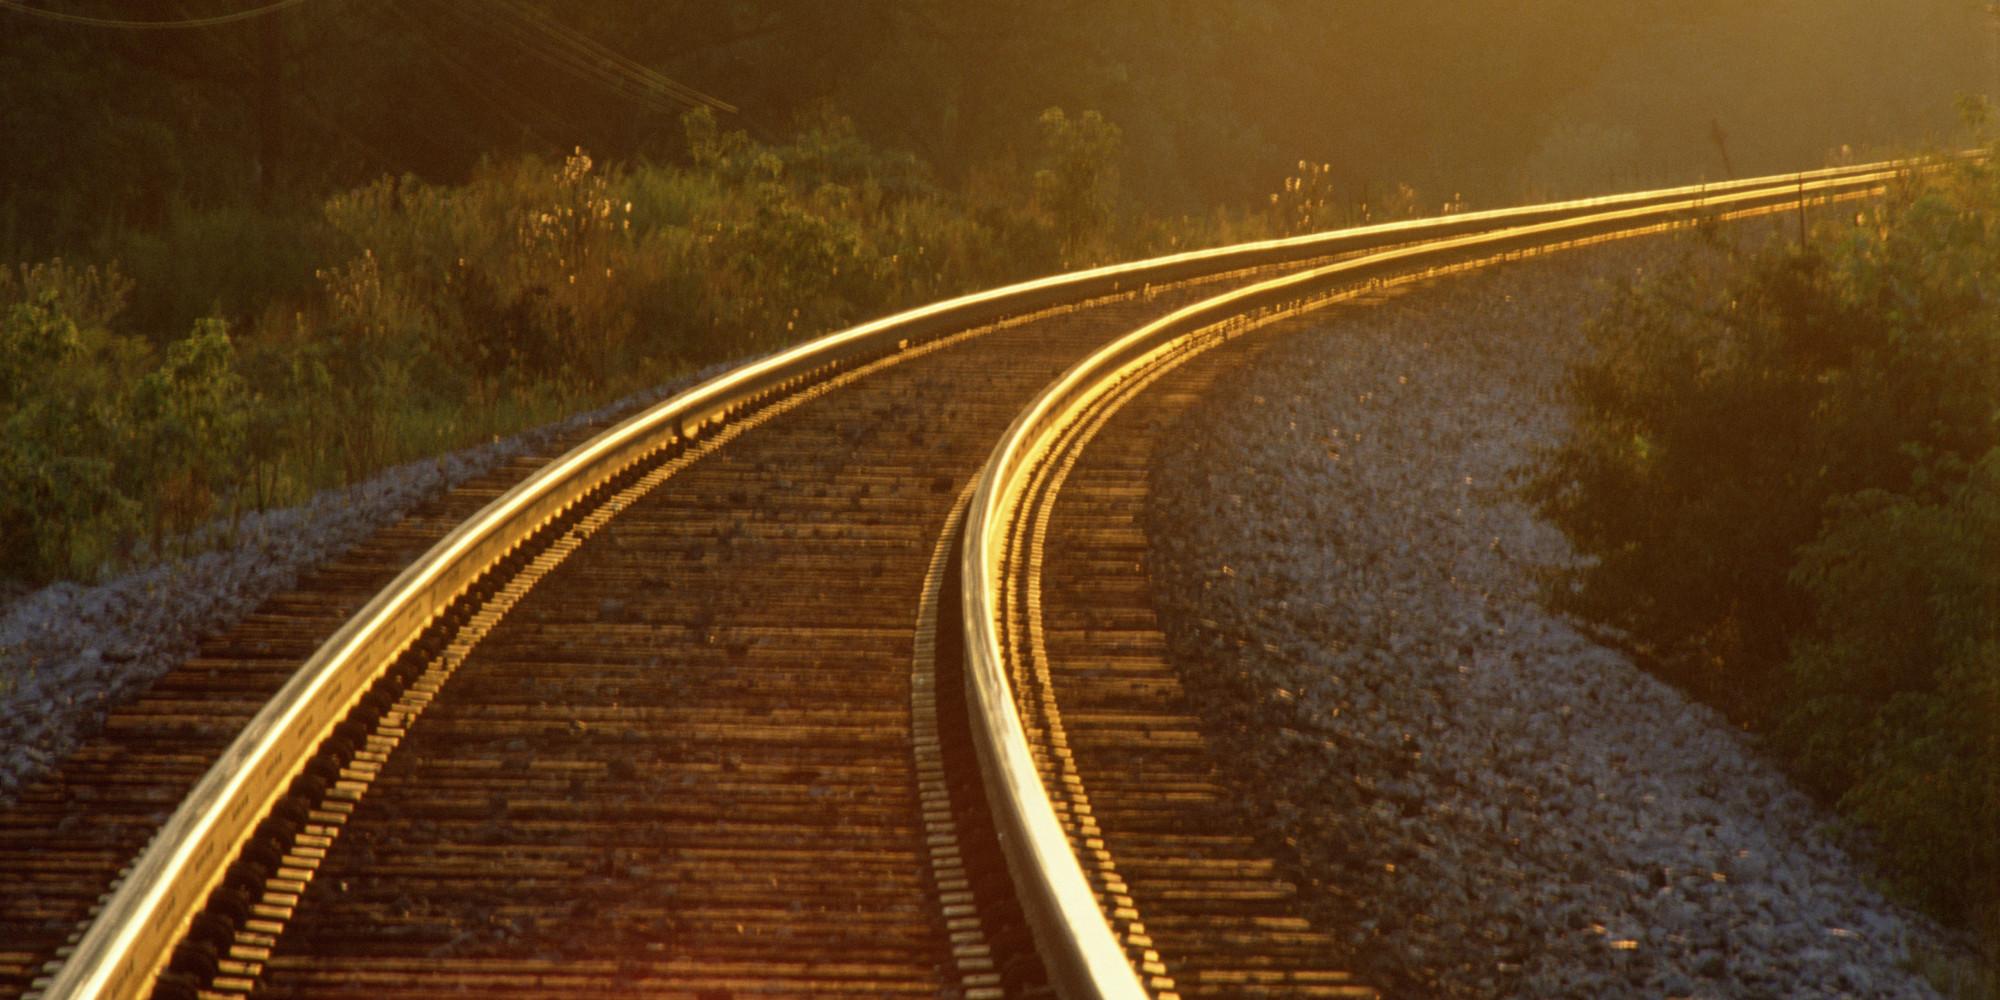 Railroad Tracks Free Stock Photo - Public Domain Pictures